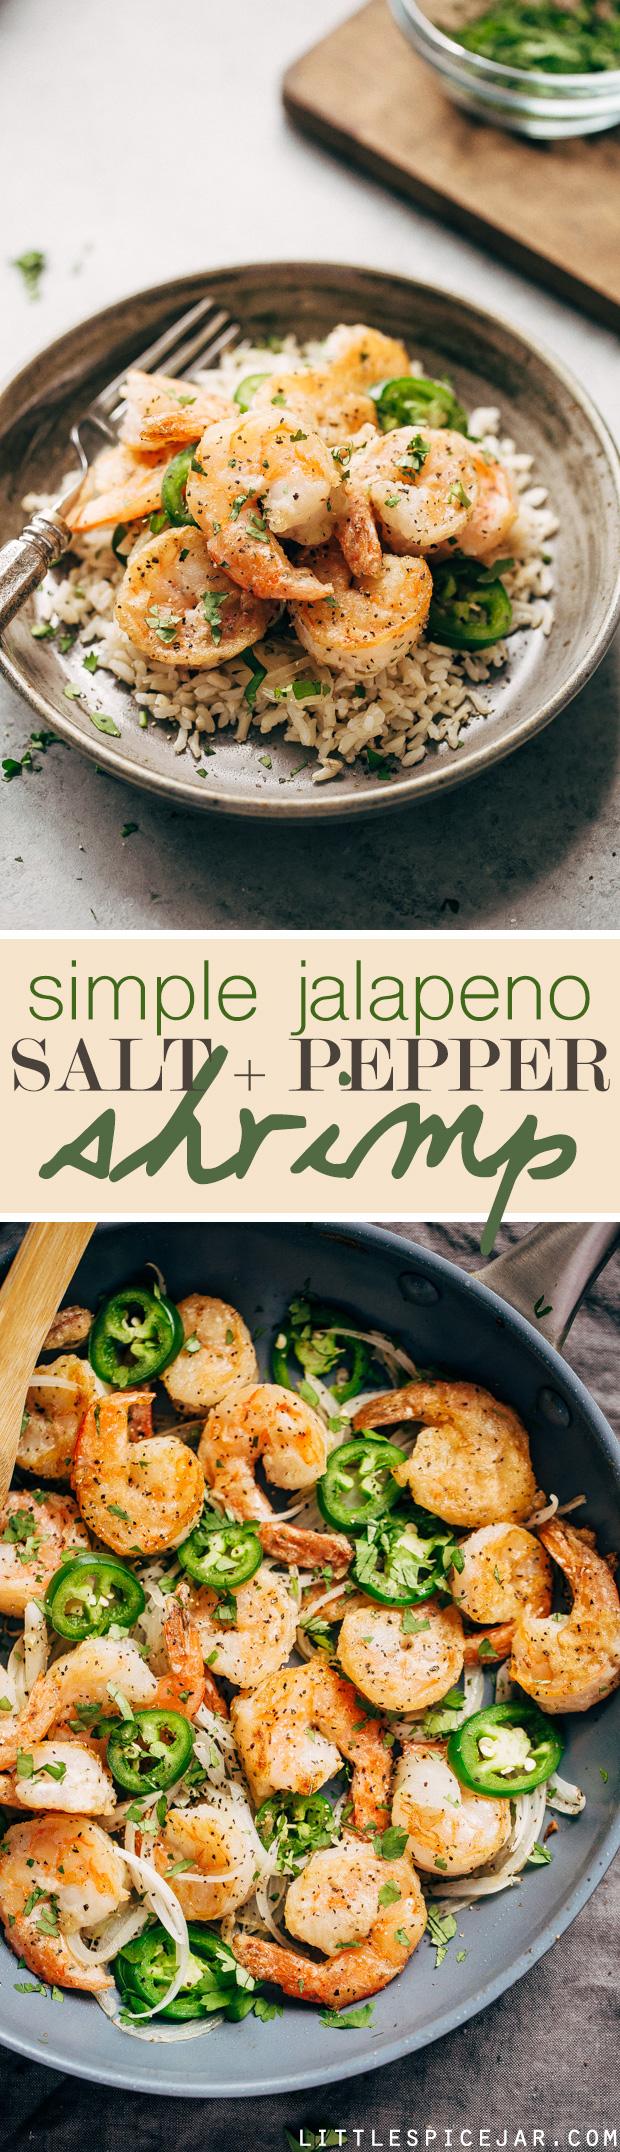 Jalapeno Salt and Pepper Shrimp - a simple 30 minute recipe for tender and sweet shrimp with a little kick! #jalapenoshrimp #sauteedshrimp #shrimp #saltandpeppershrimp | Littlespicejar.com